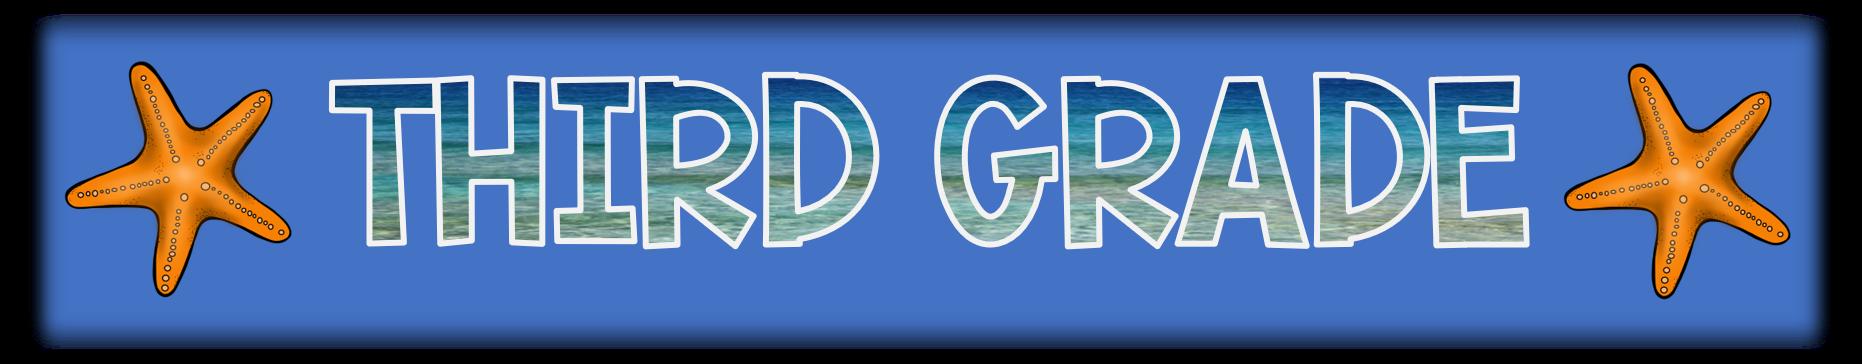 banner reading third grade